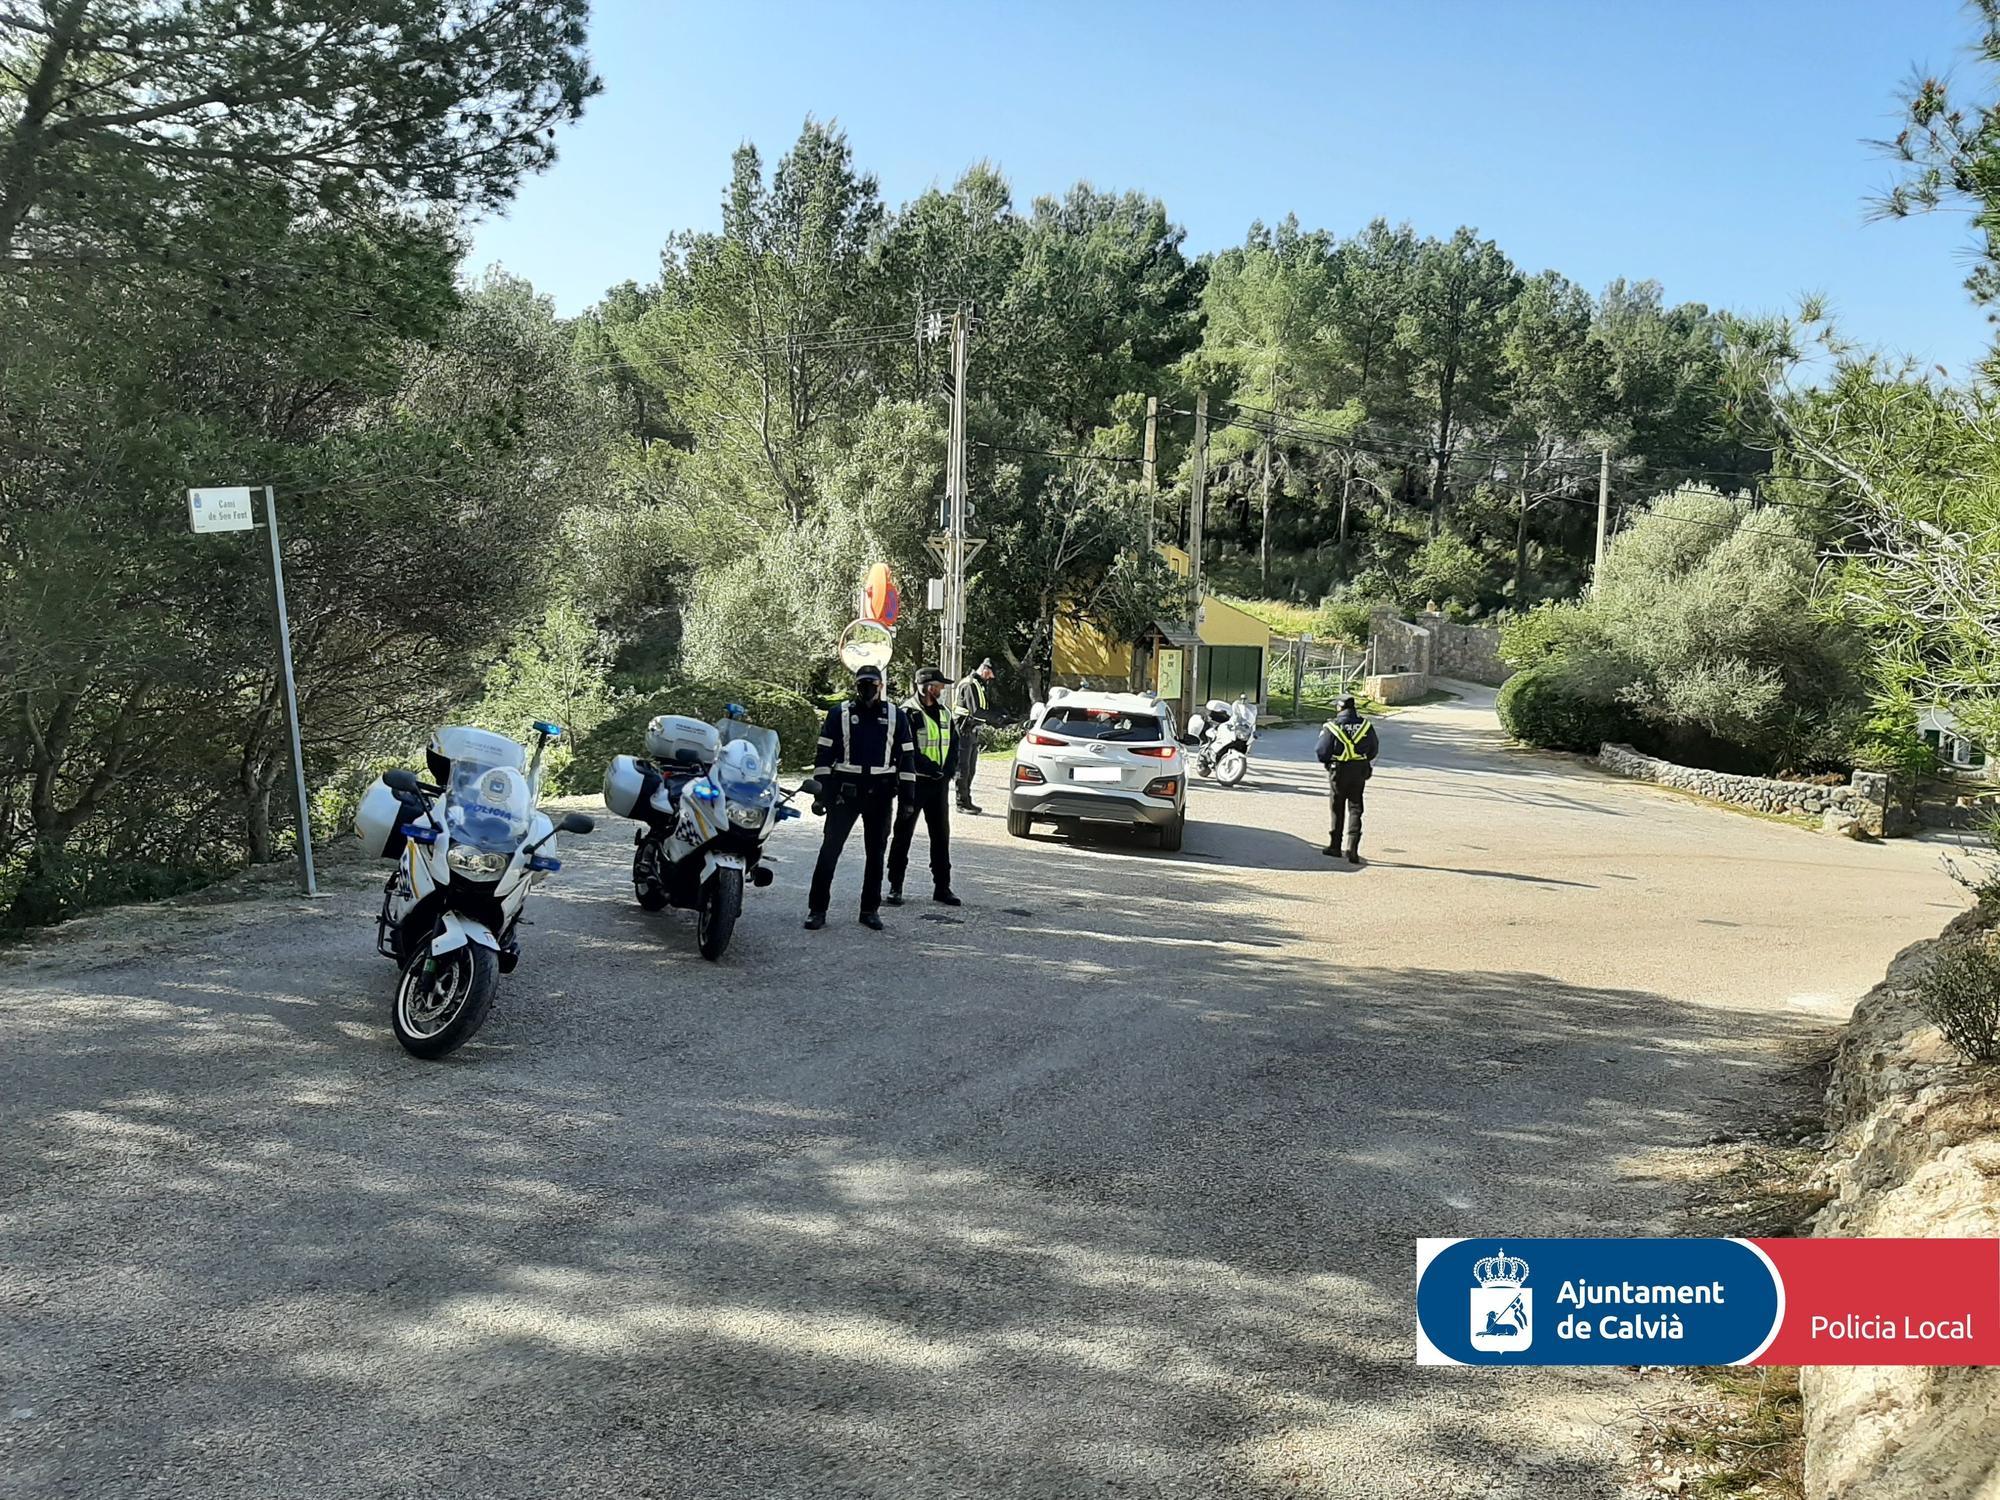 Desalojan una fiesta ilegal con 35 personas en Calvià